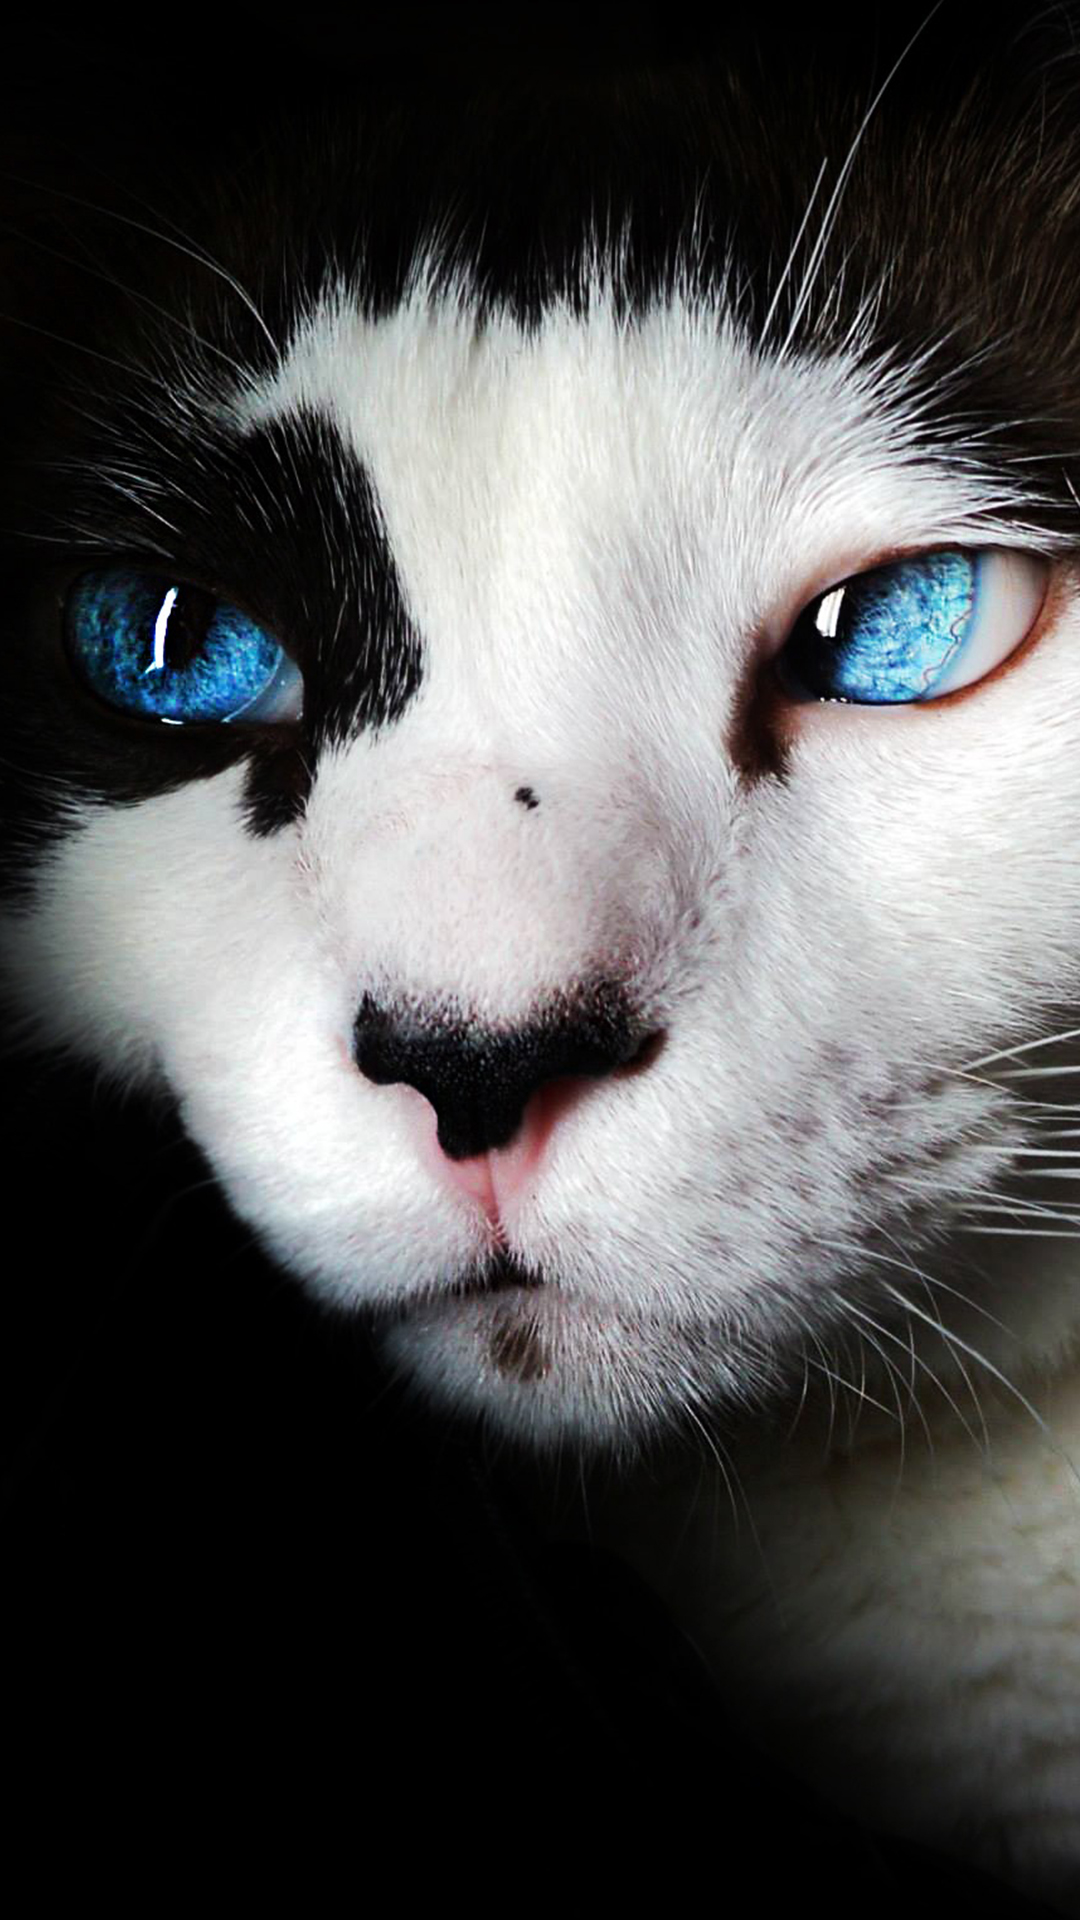 My Best Phone Wallpapers - แมว ตา สี ฟ้า , HD Wallpaper & Backgrounds